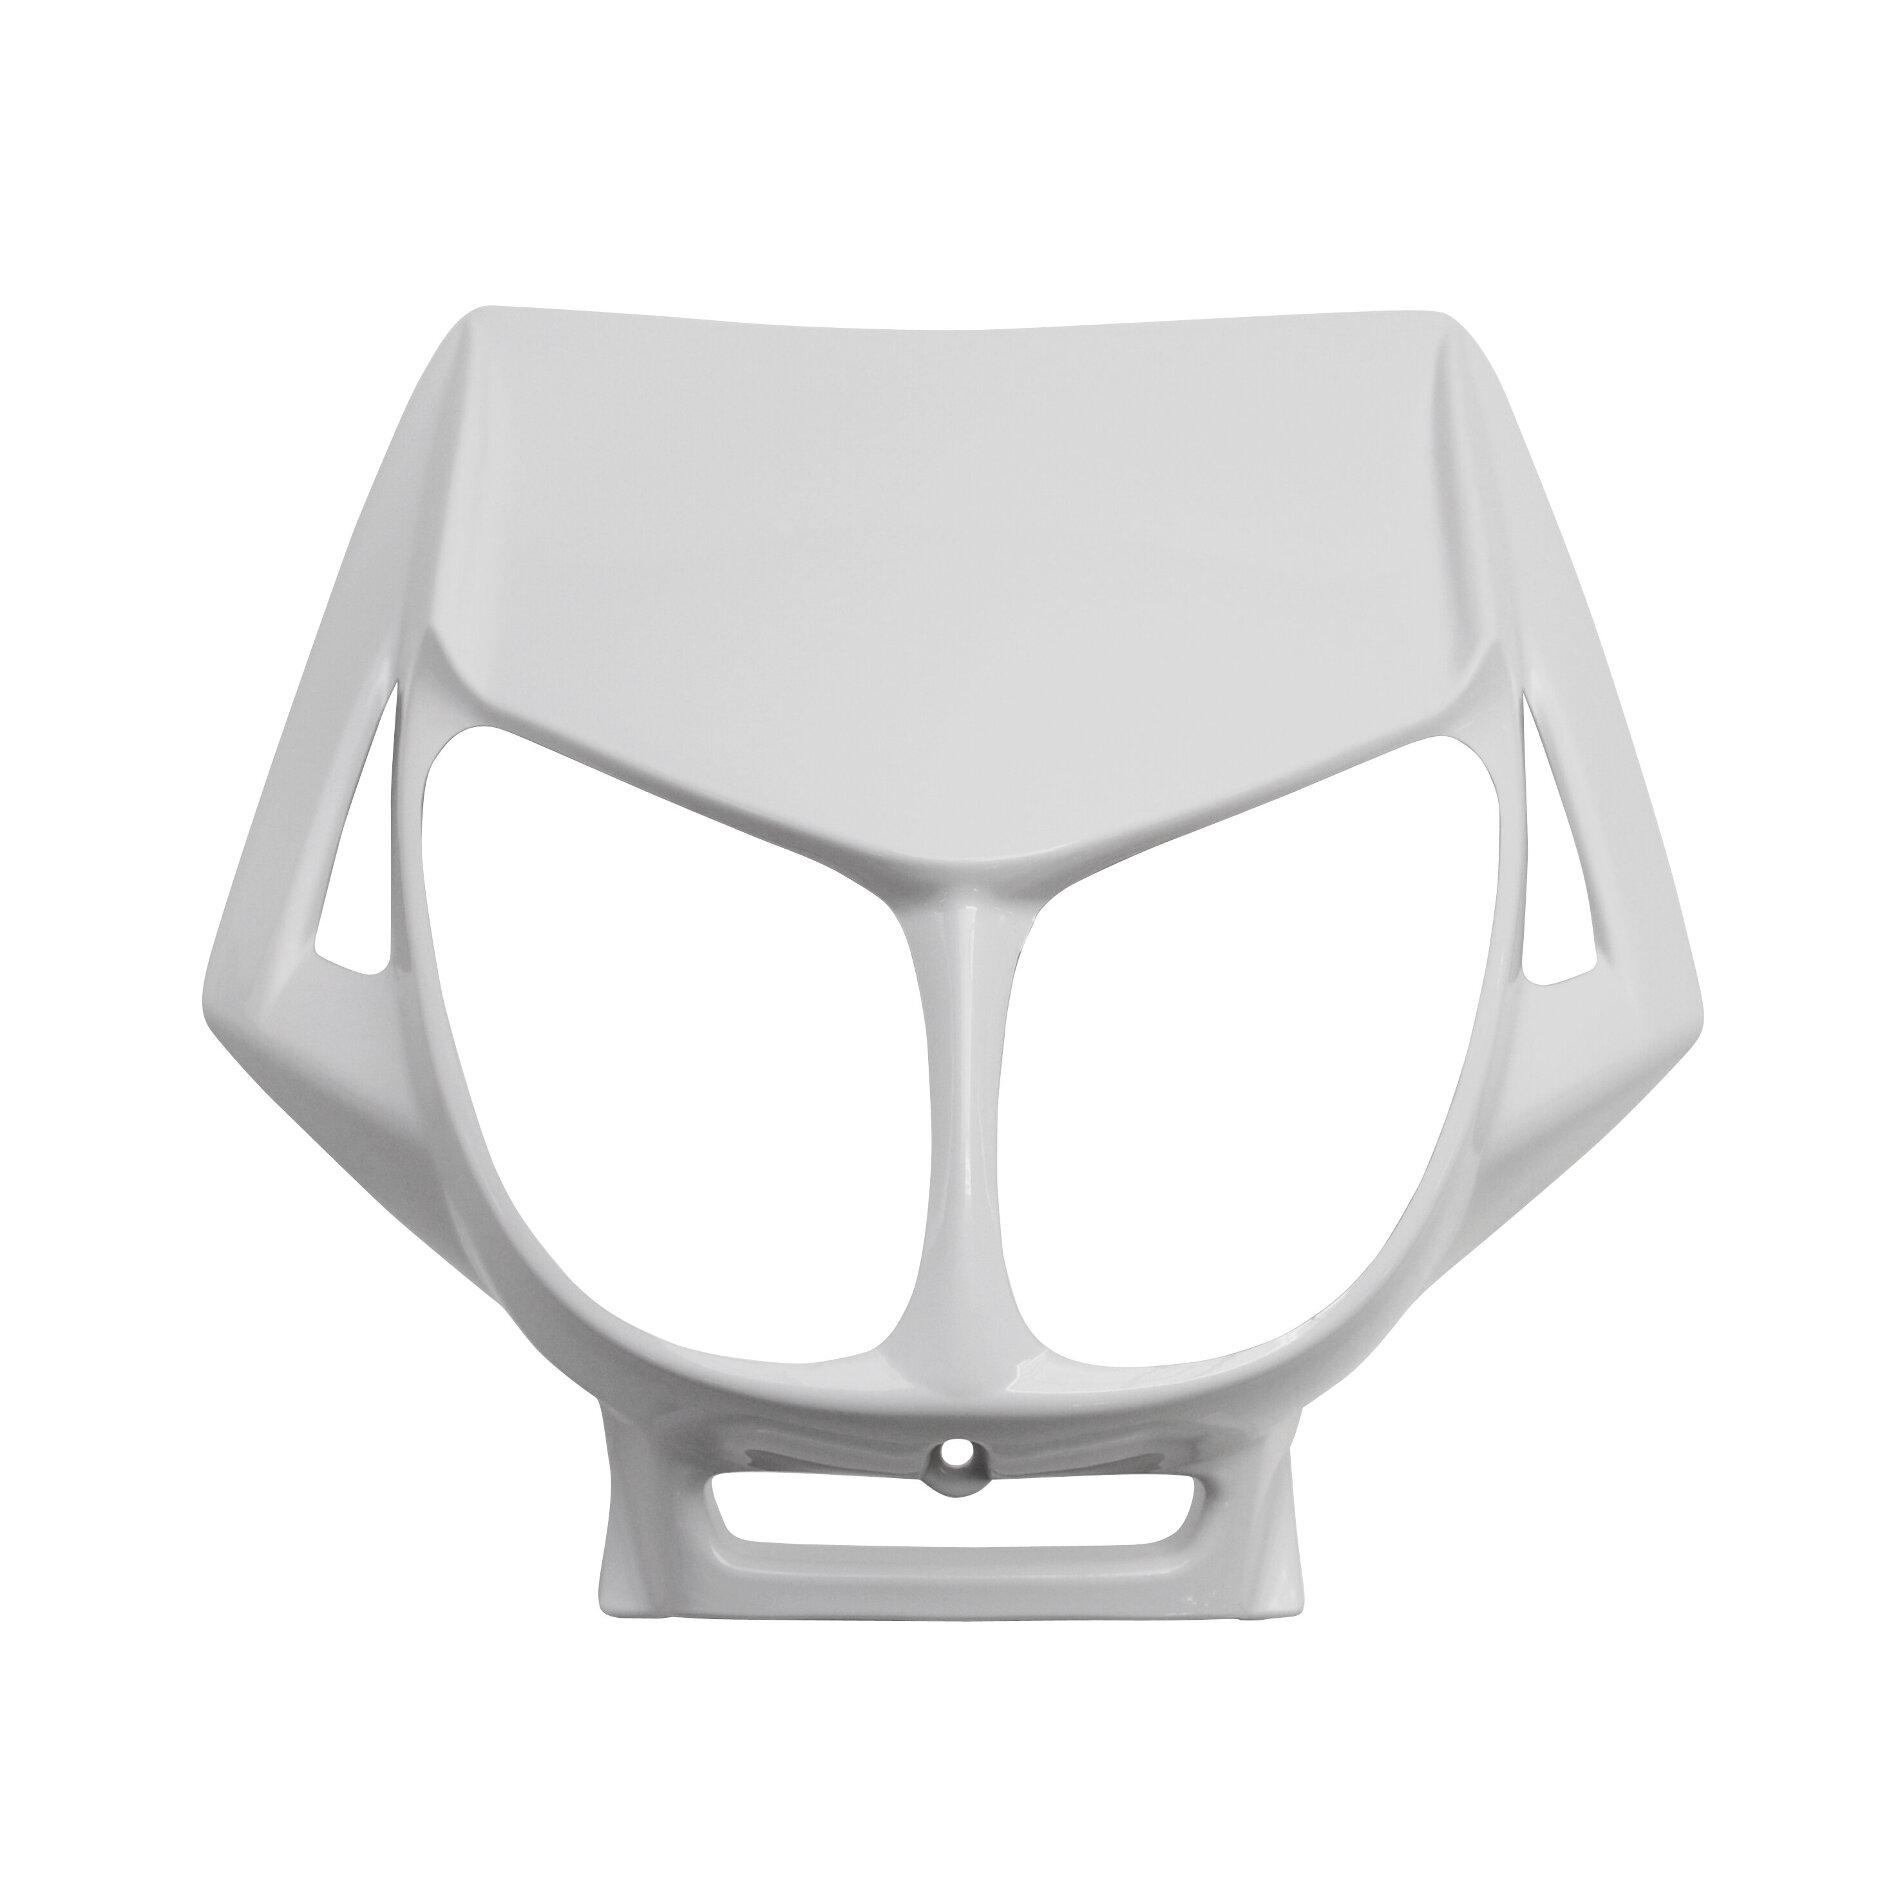 Tête de fourche blanc brillant adaptable derbi senda drd x-treme/x-rac